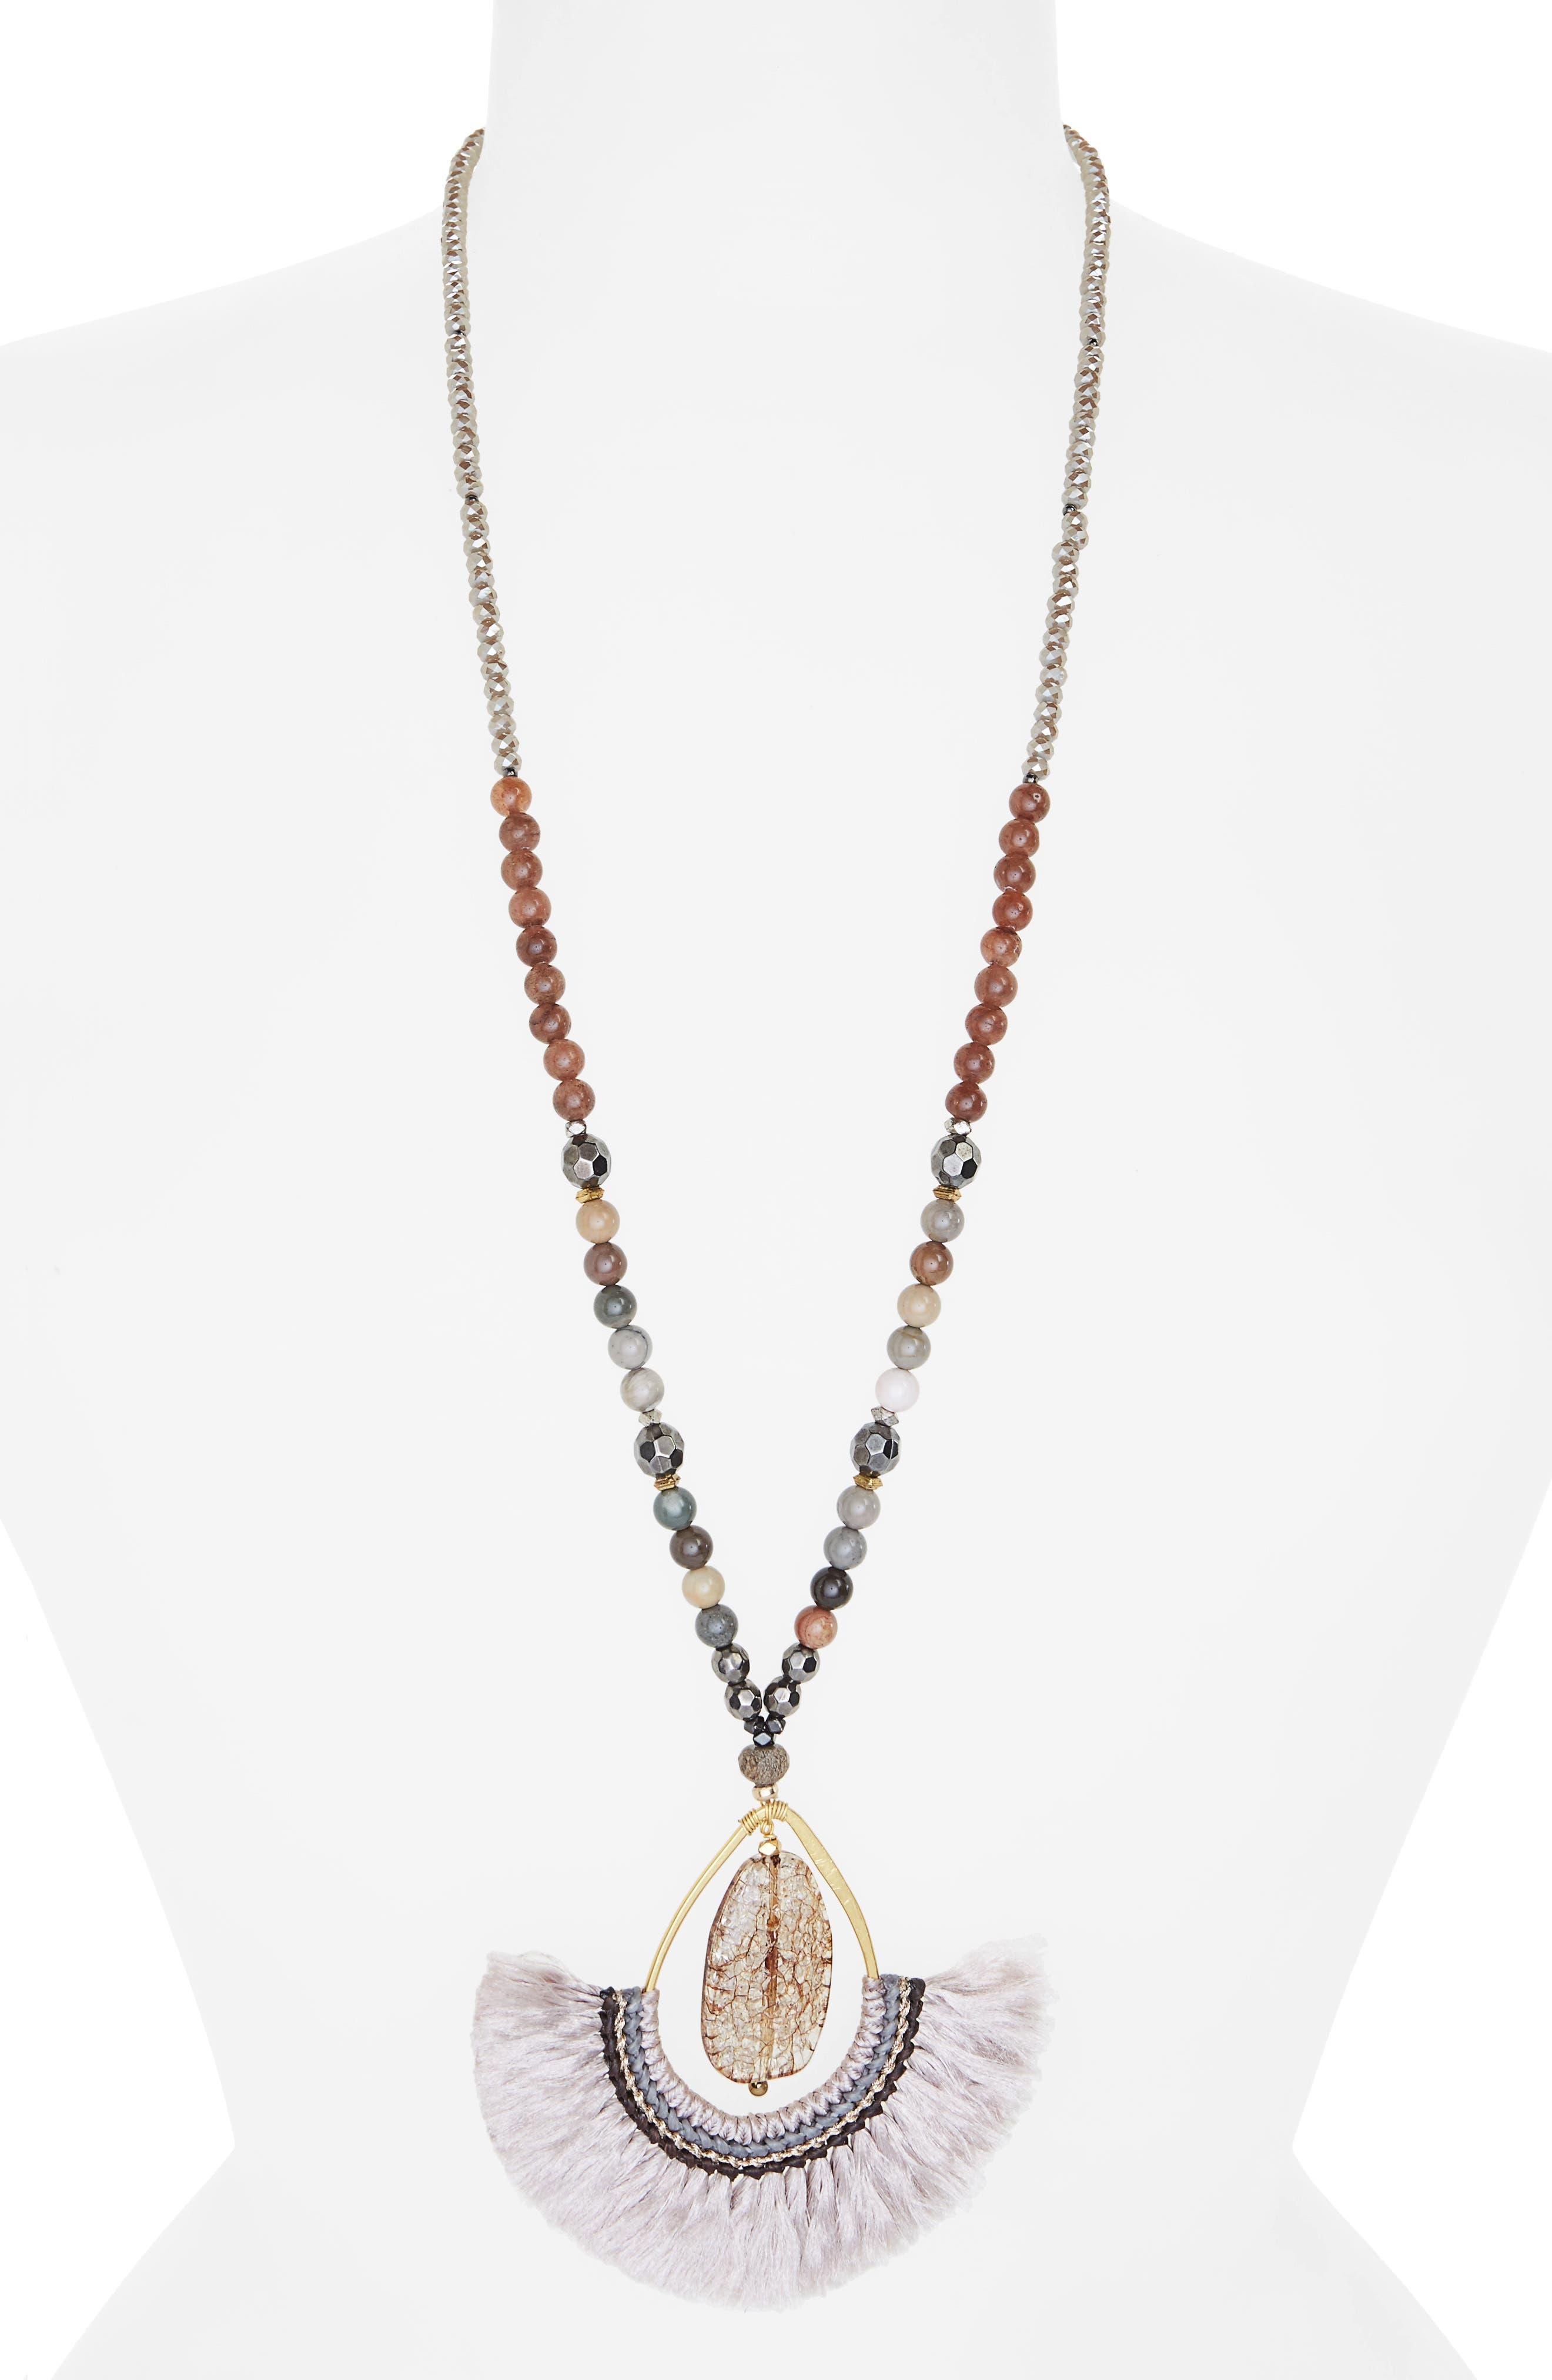 Main Image - Nakamol Design Fringed Agate Teardrop Pendant Necklace